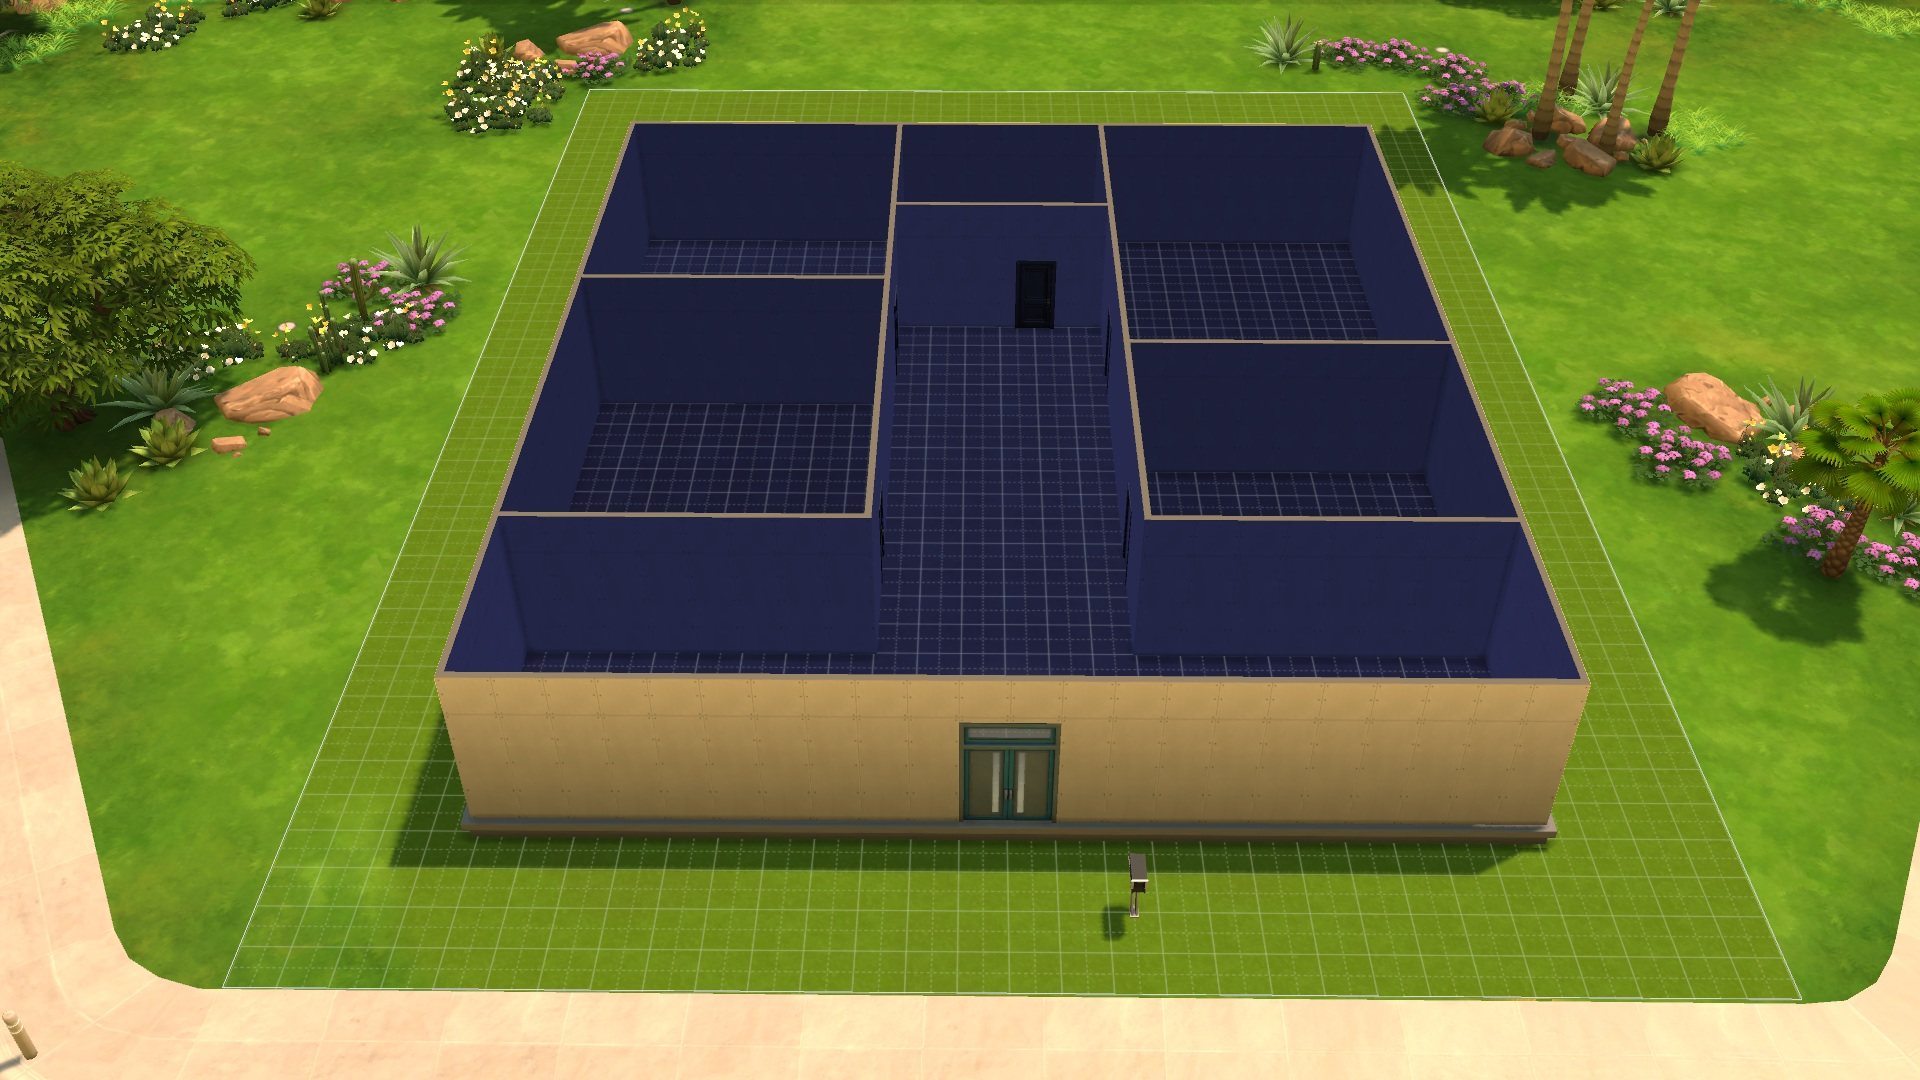 Les sims 4 construire sa maison 2 game guide for Construction maison sims 3